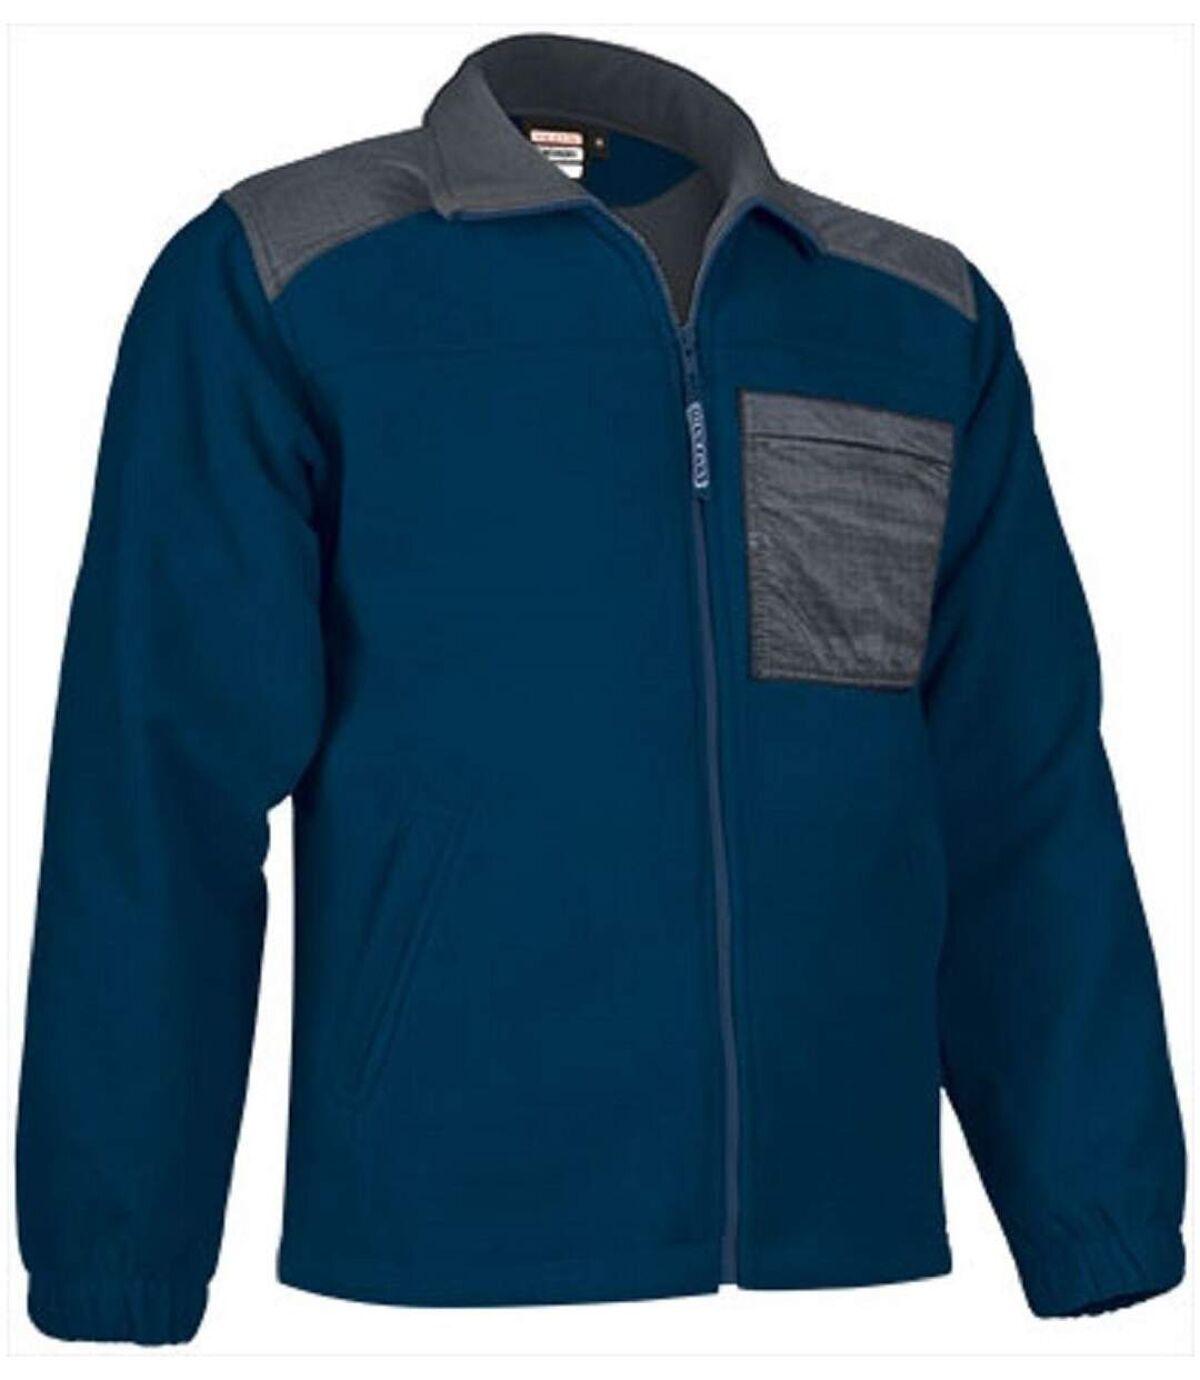 Veste polaire zippée - Homme - REF NEVADA - bleu marine